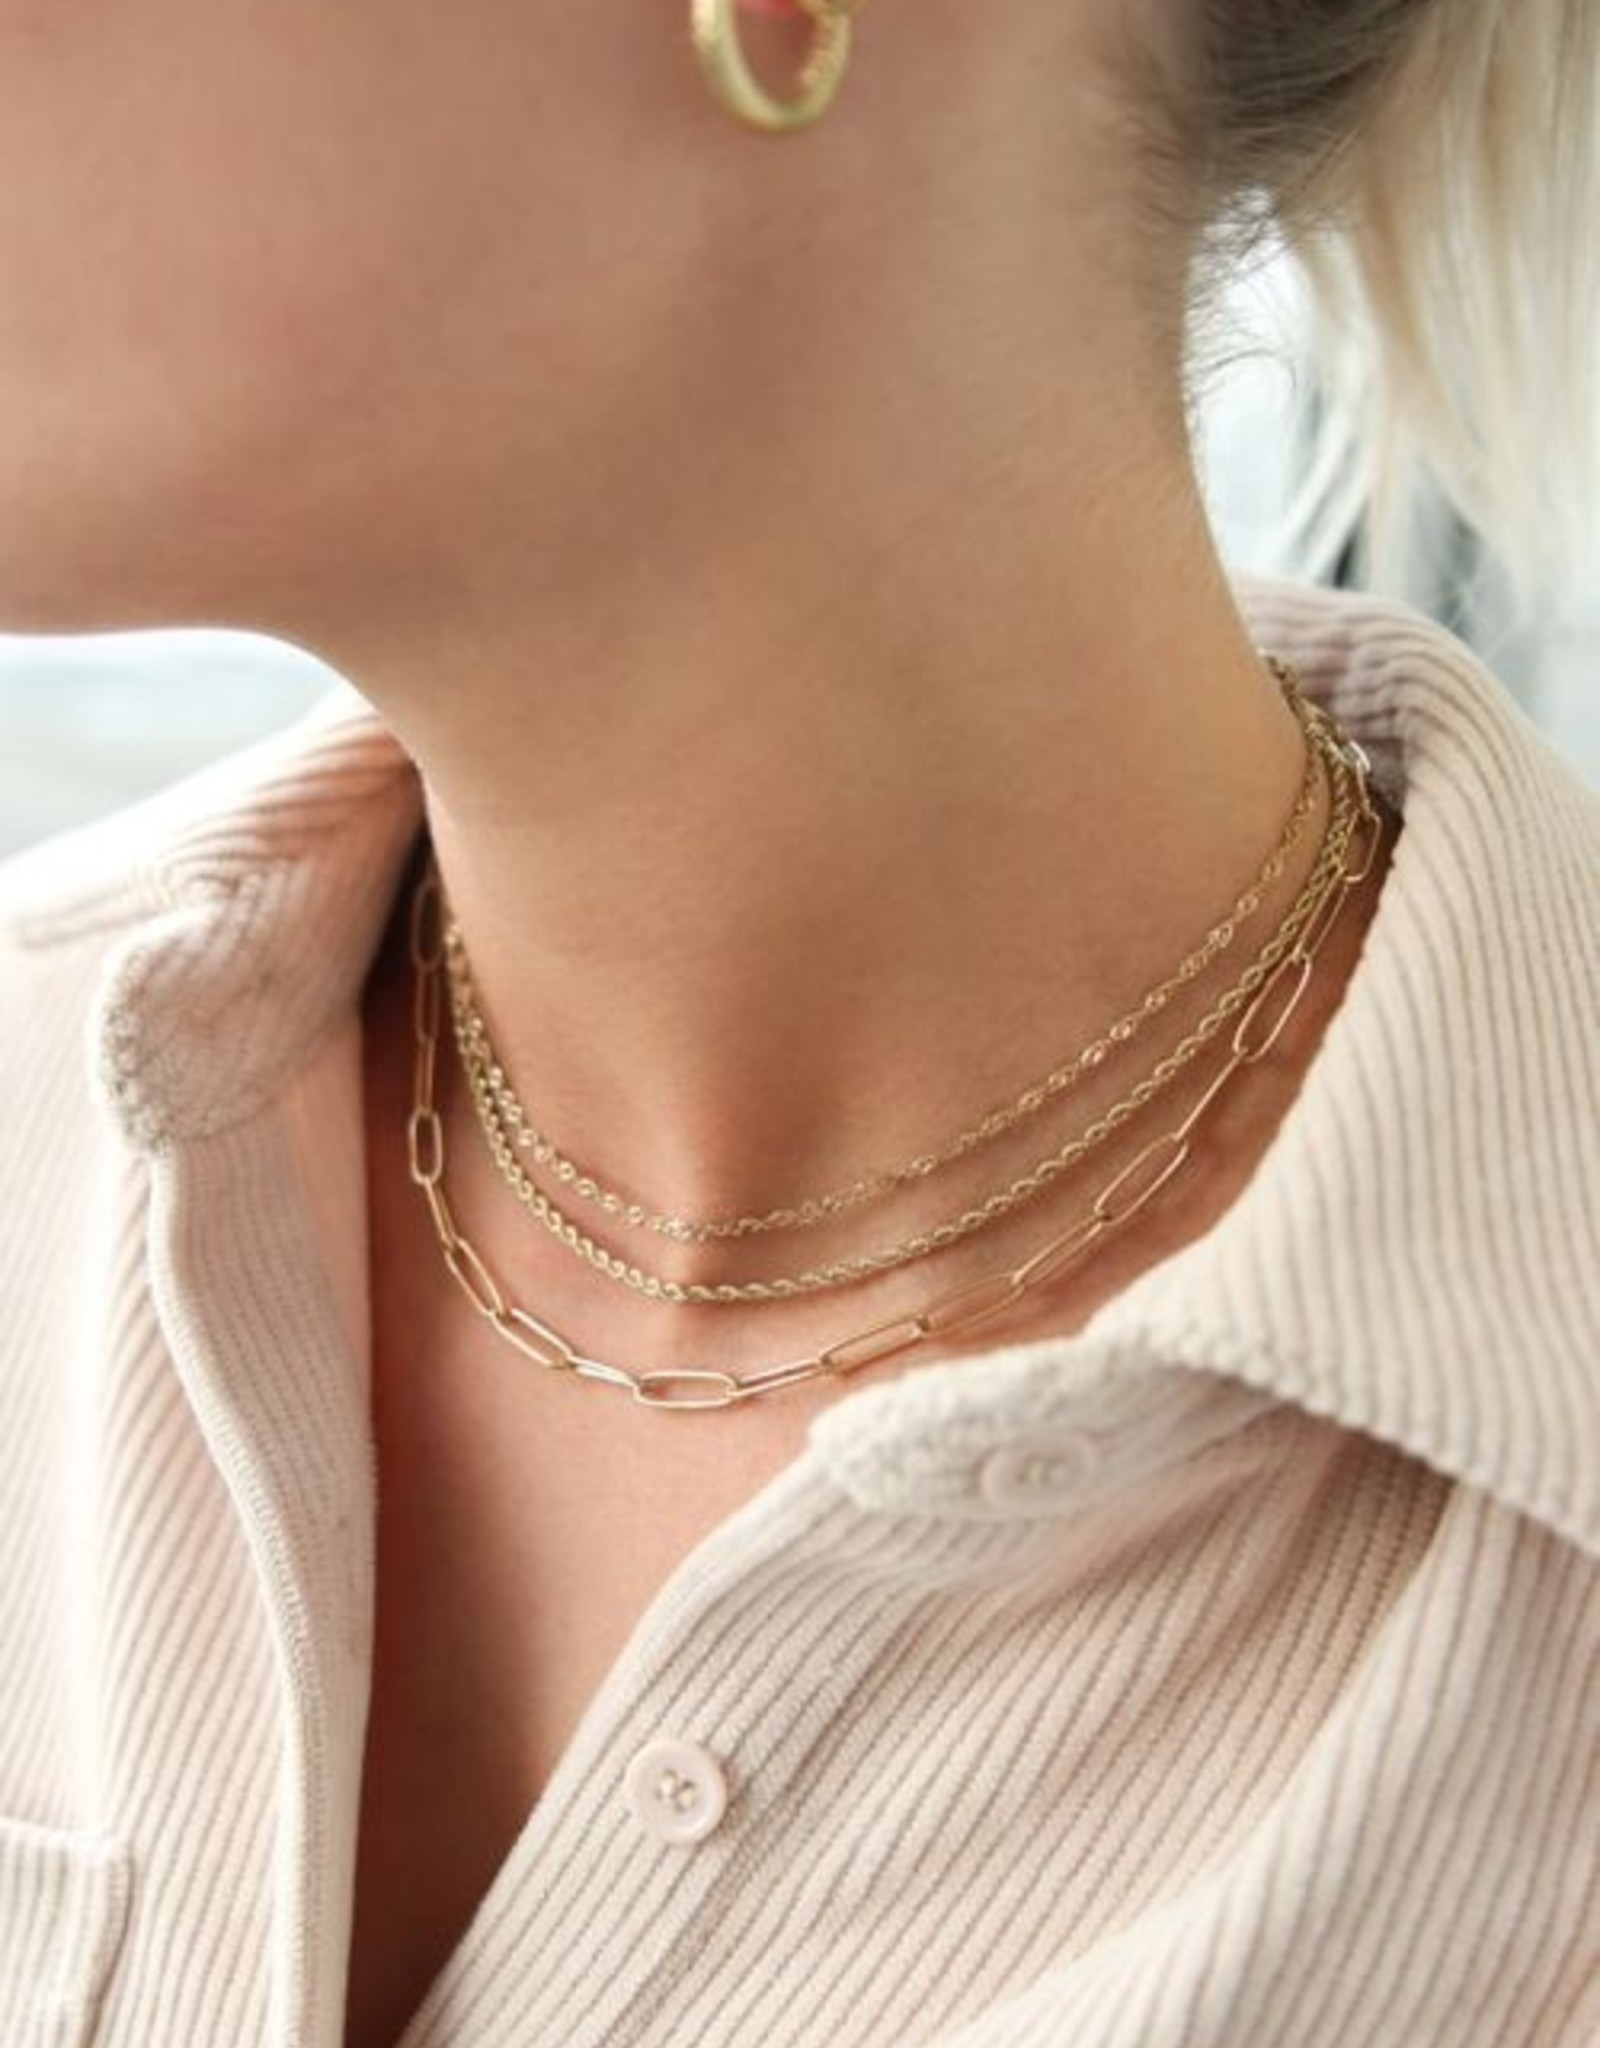 My Jewelry Ketting fijne schakels middellang-silver